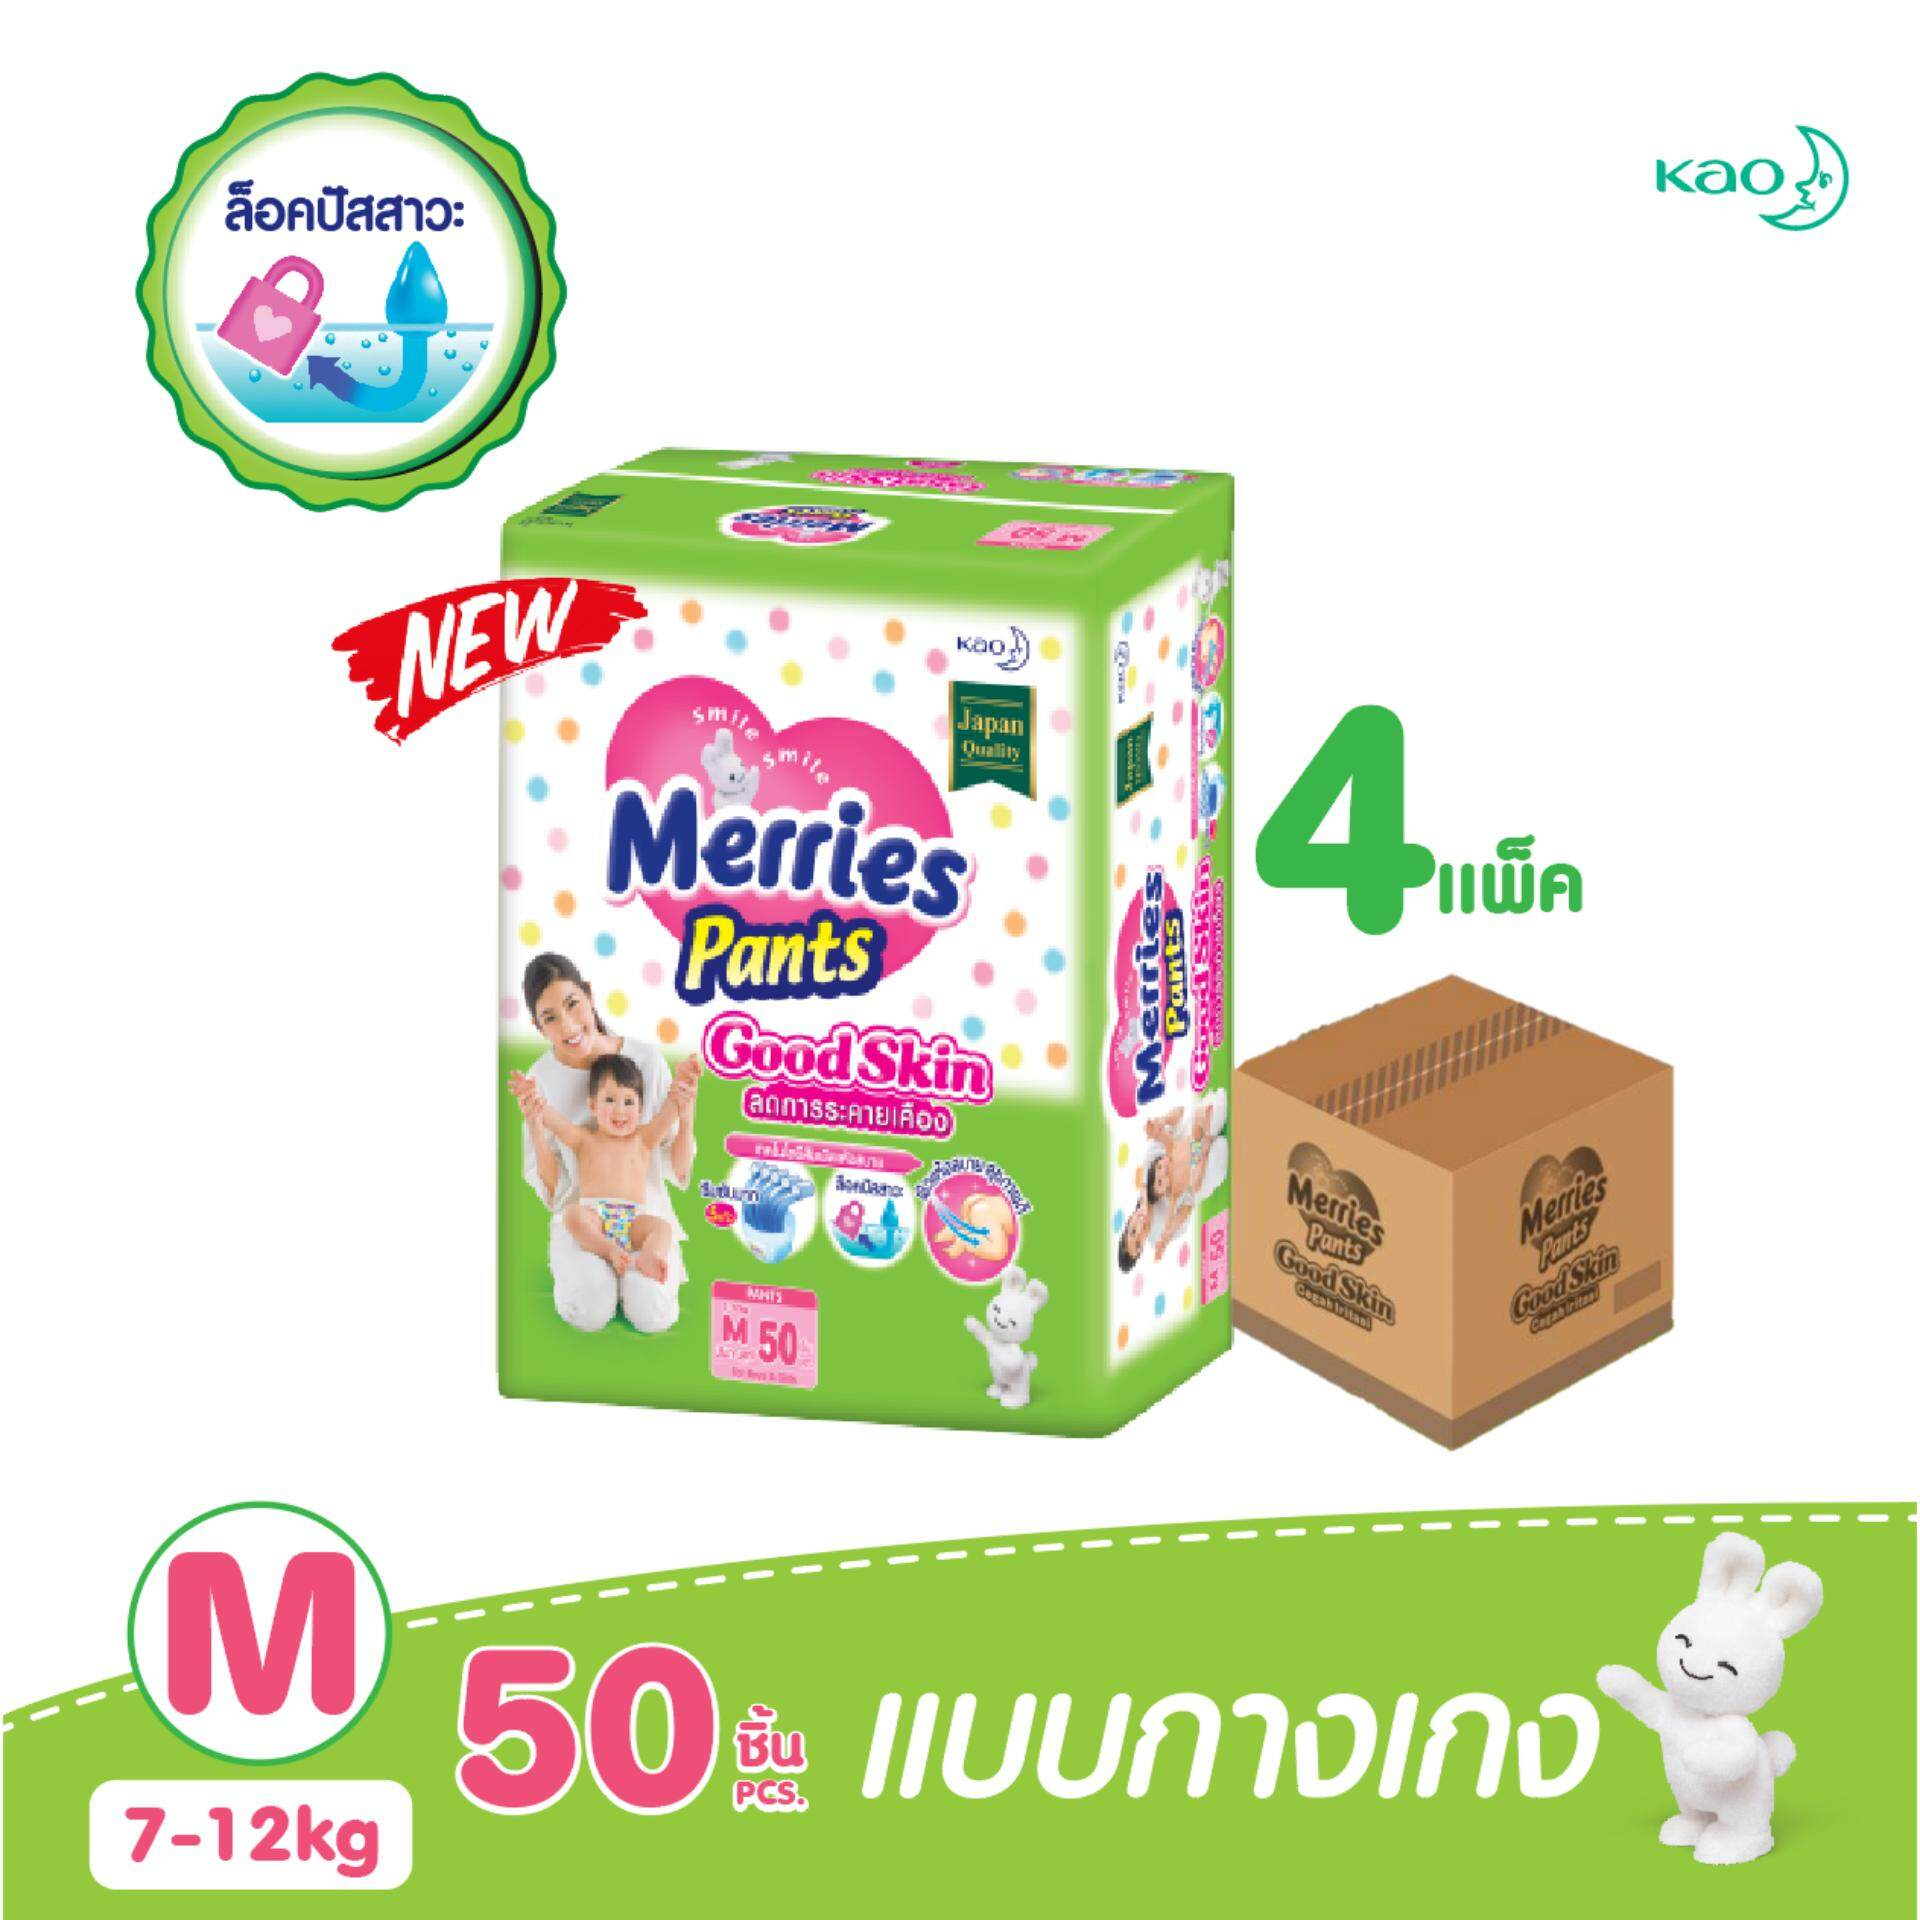 Thailand Merries Pants Good Skin M22 M50